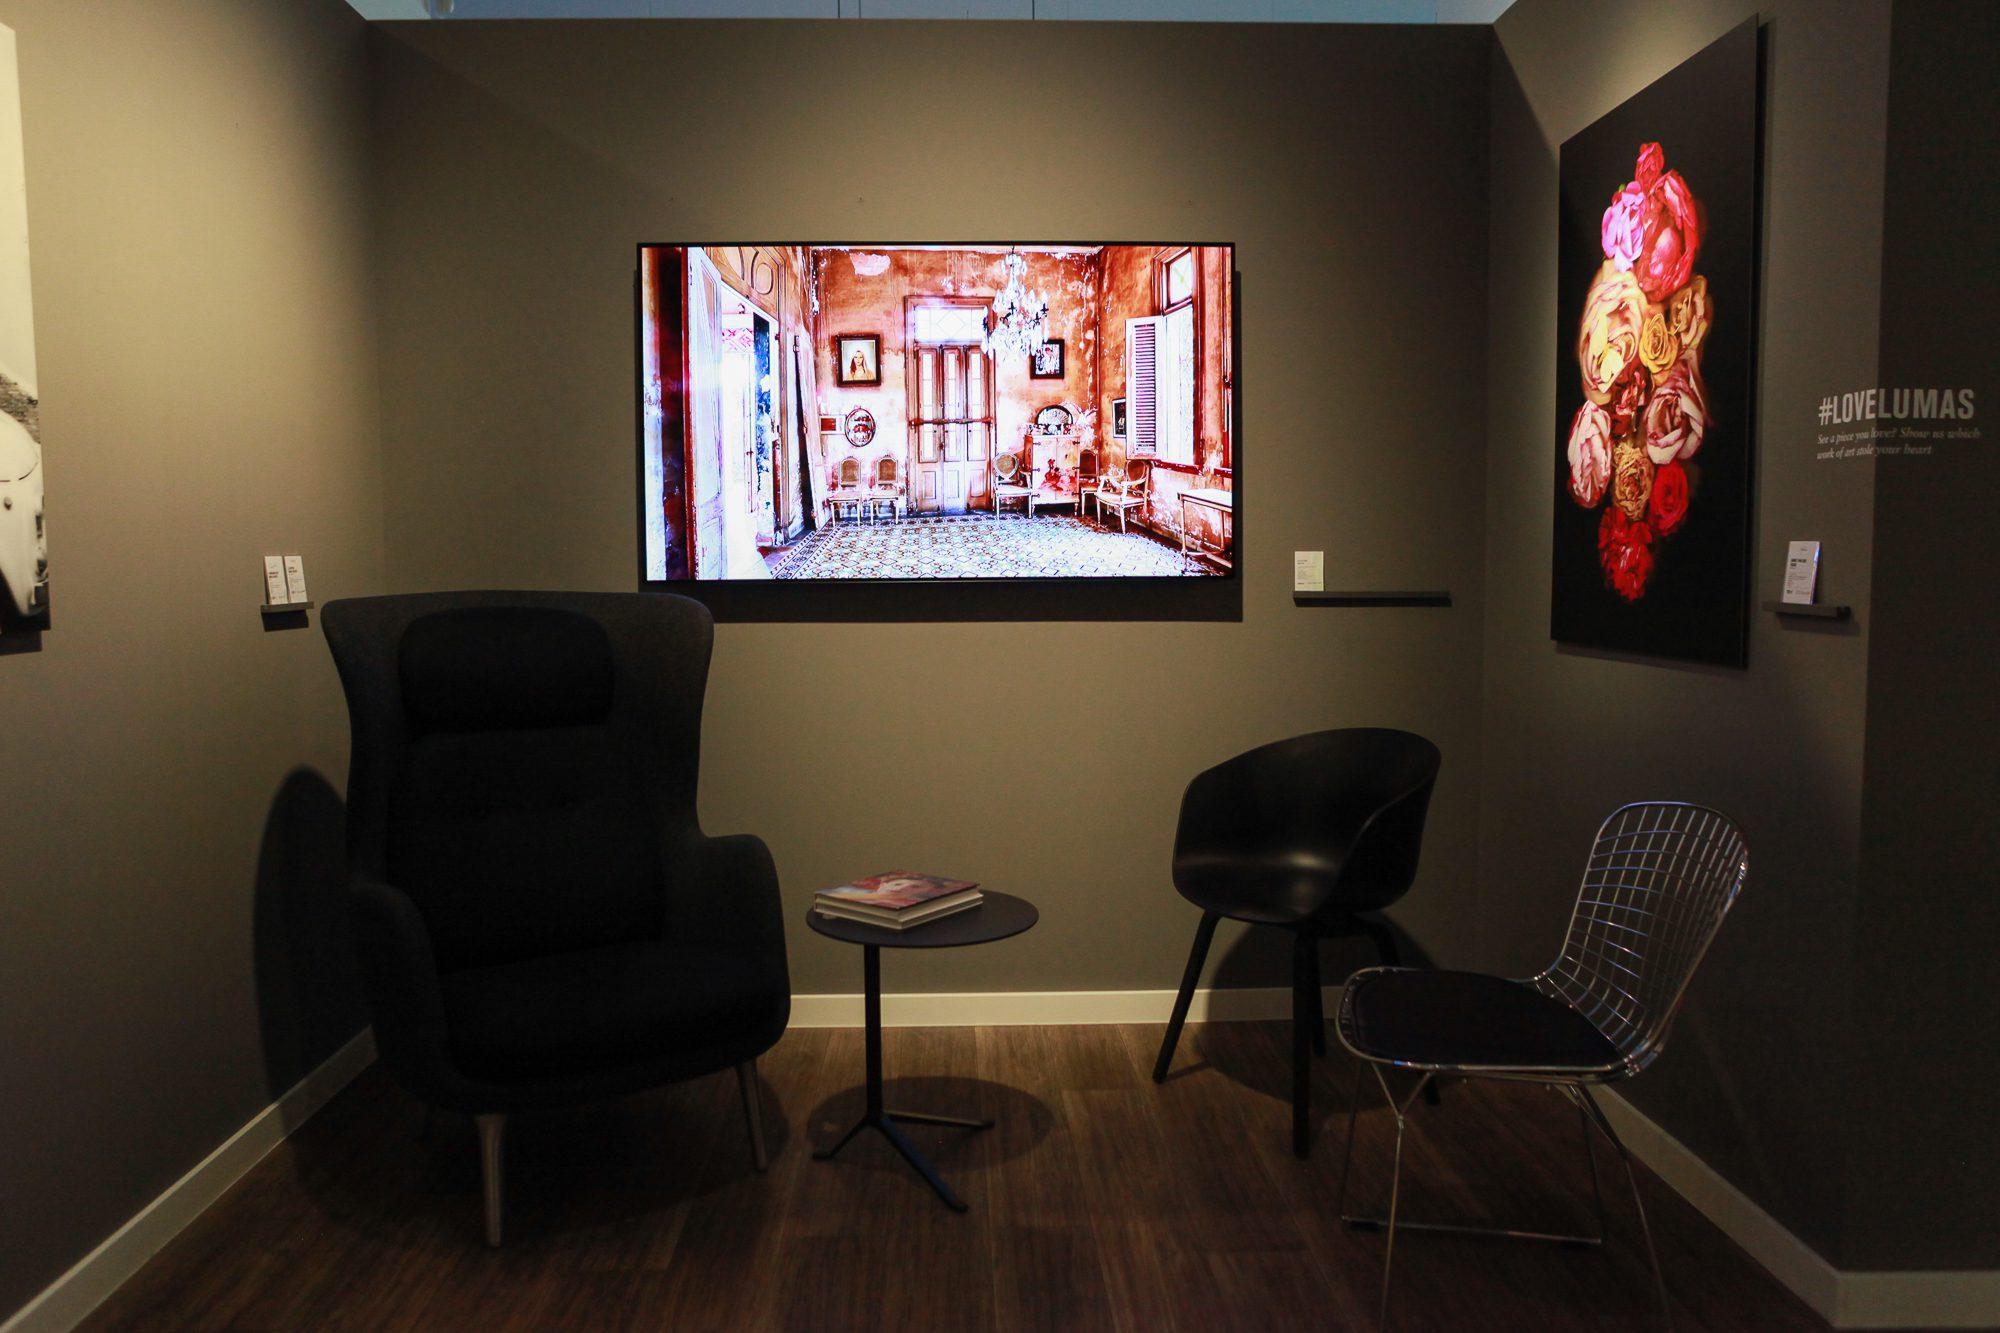 LG OLED – Mint kép a falon